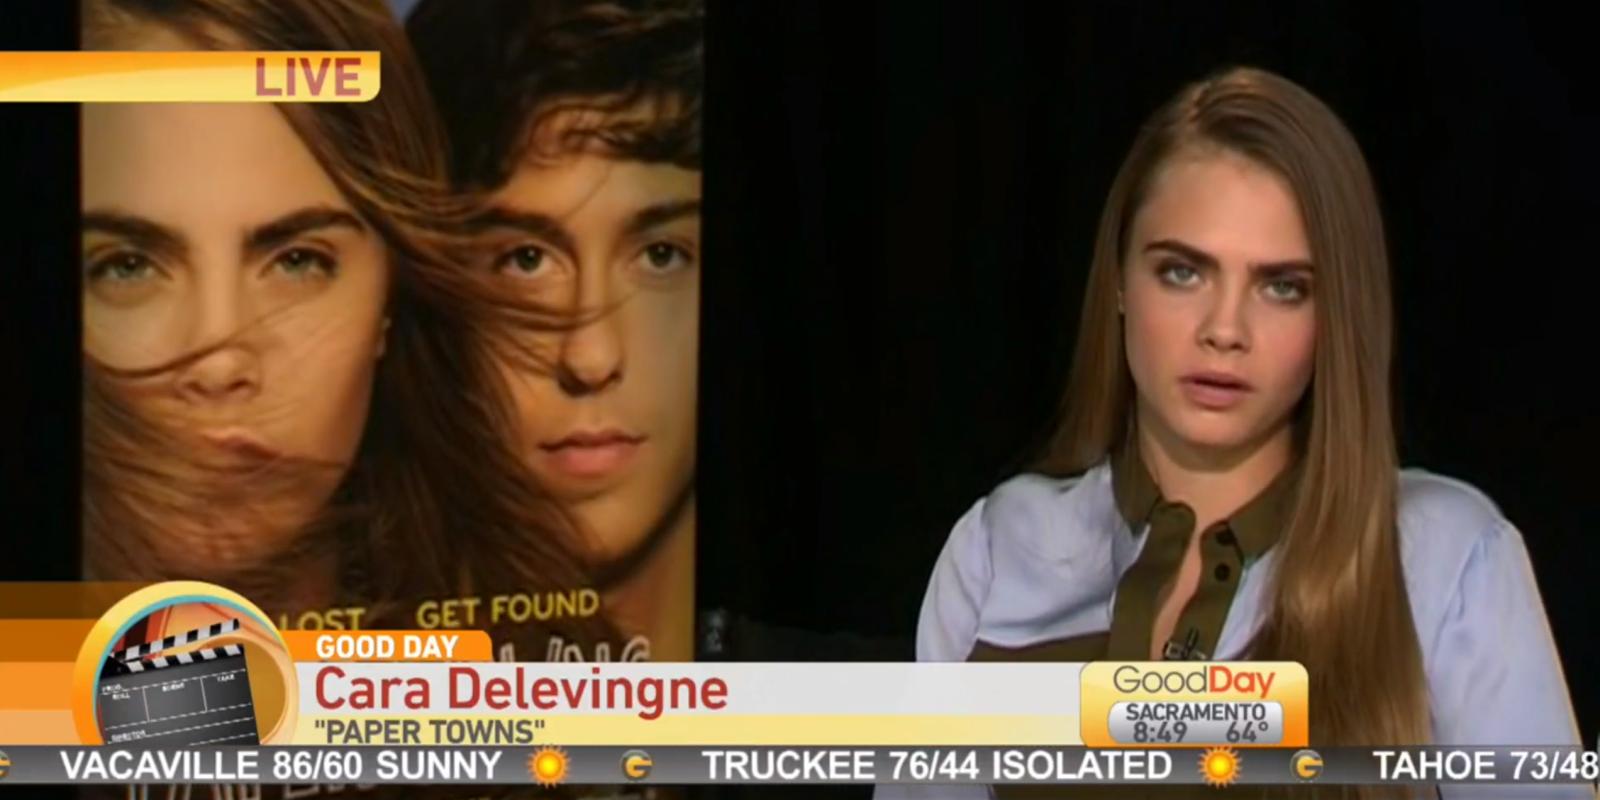 Cara Delevingne Interview Awkward Youtube